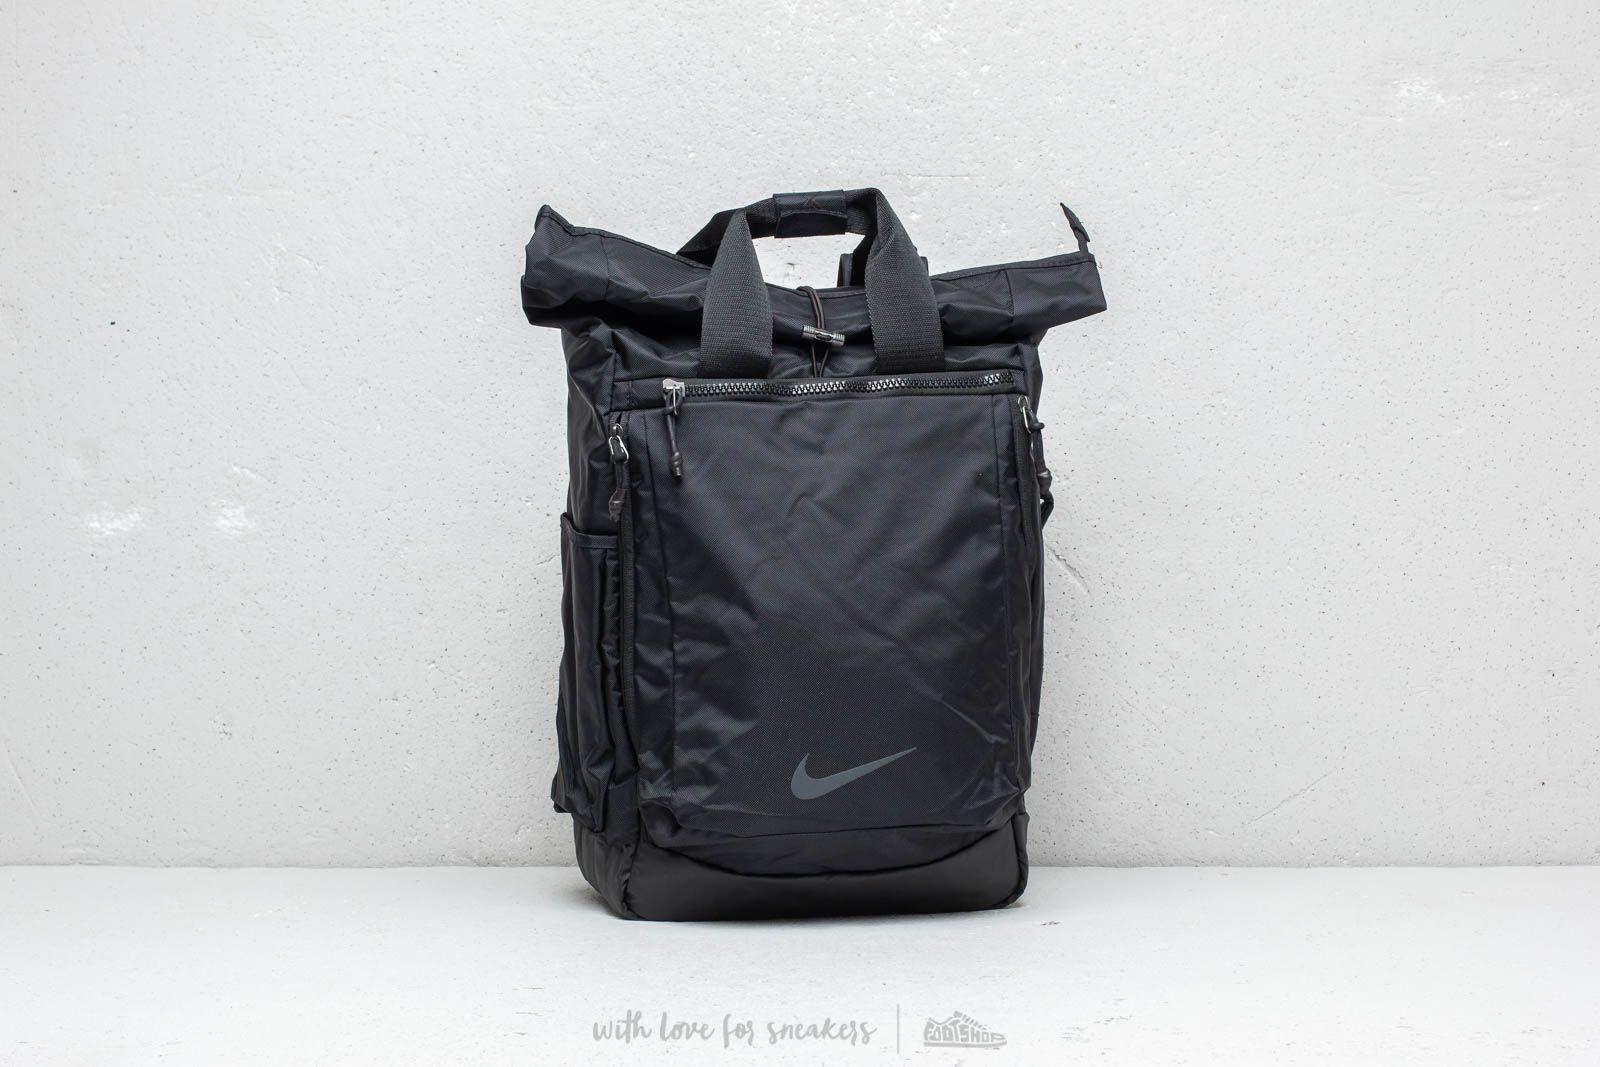 0 Energy Backpack Vapor Nike BlackFootshop 2 Training cTlJK1Fu3